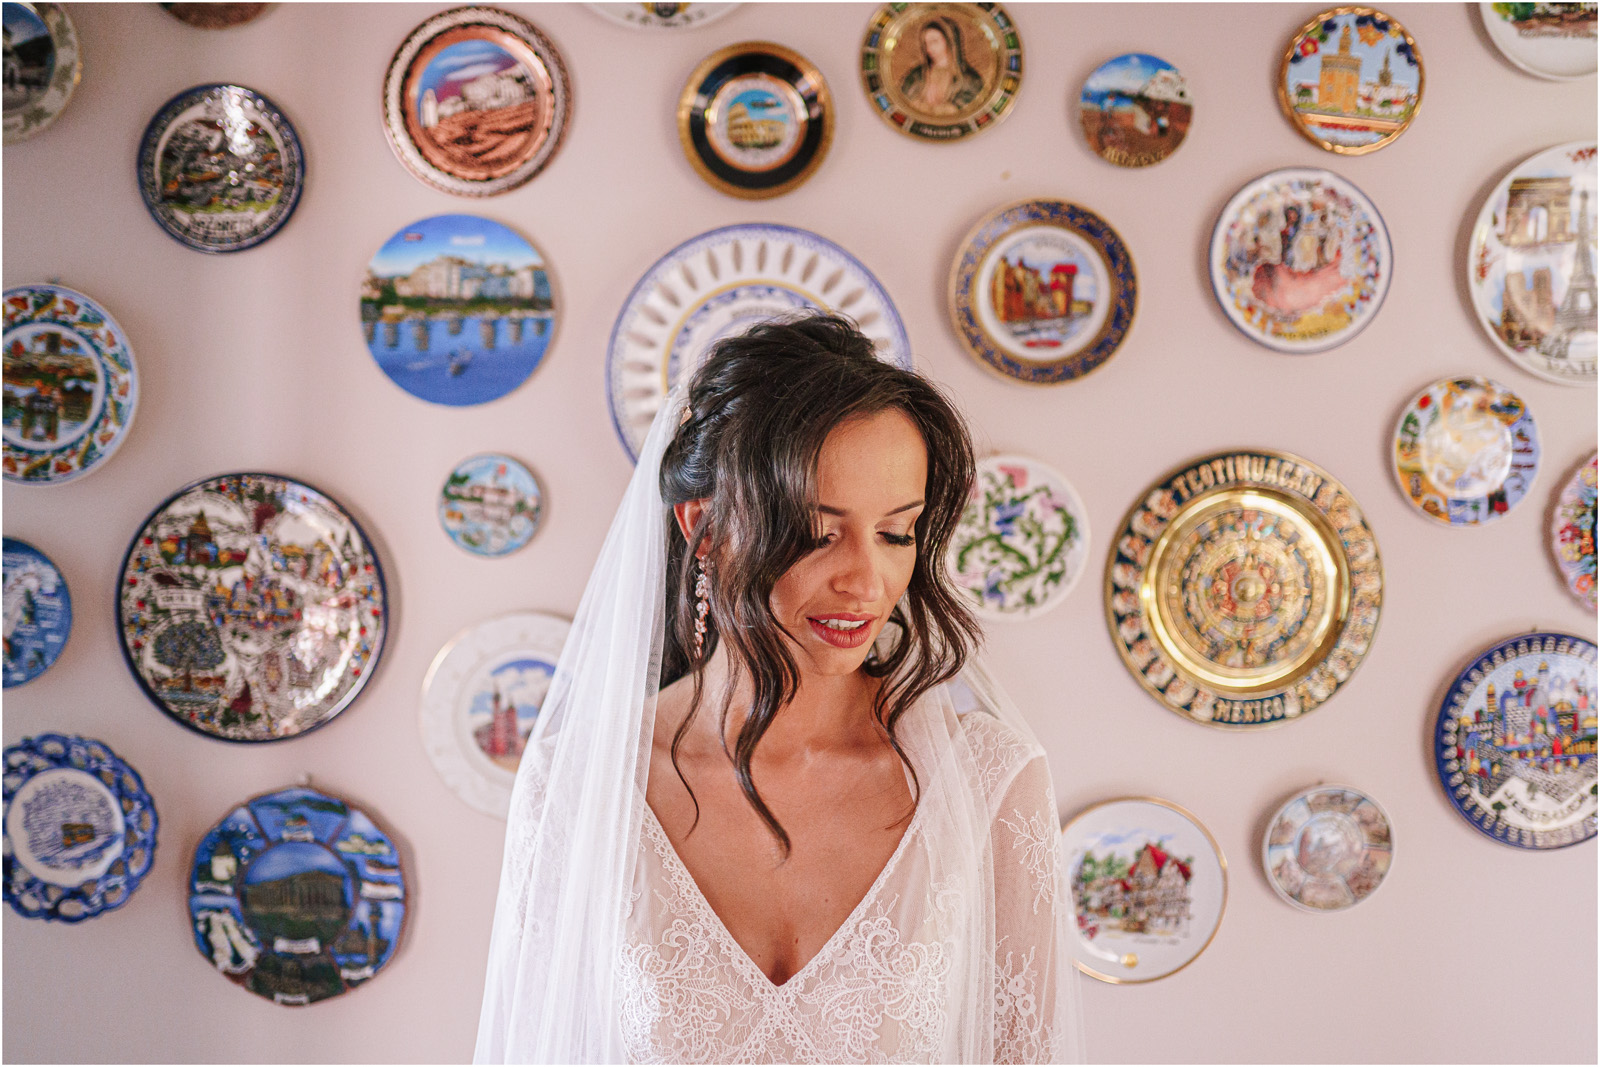 Ania & Mateusz | boho wesele w Stodole pod Kasztanami 16